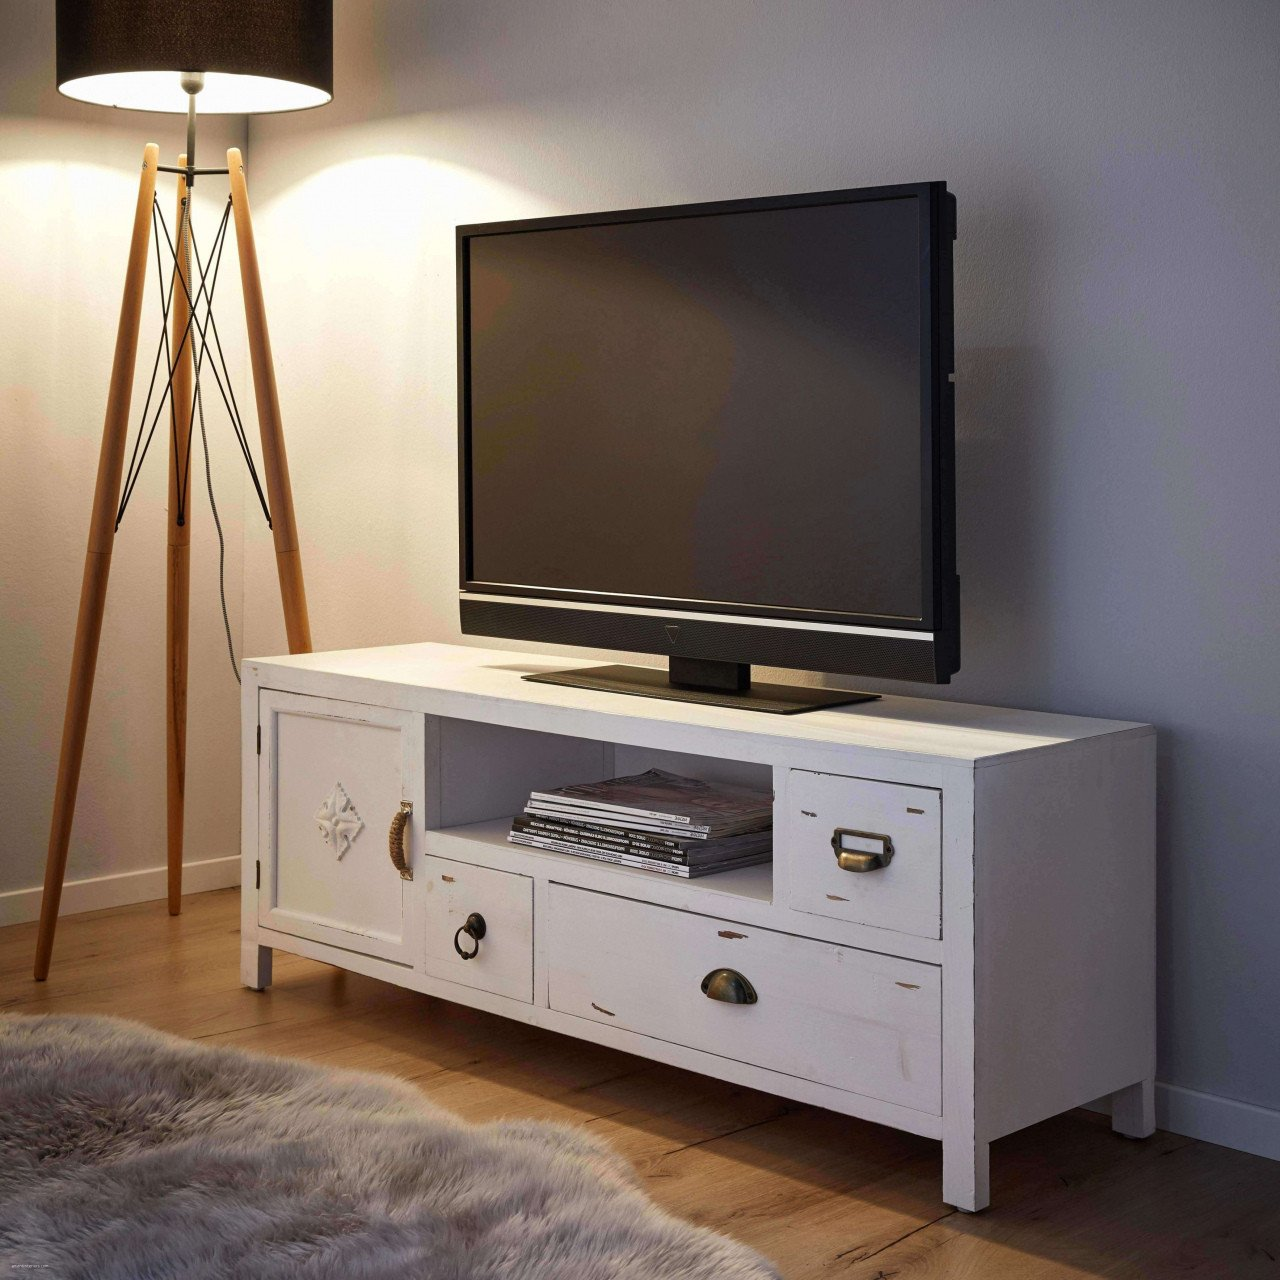 Table for Tv In Bedroom Elegant Bedroom Tv Stand — Procura Home Blog